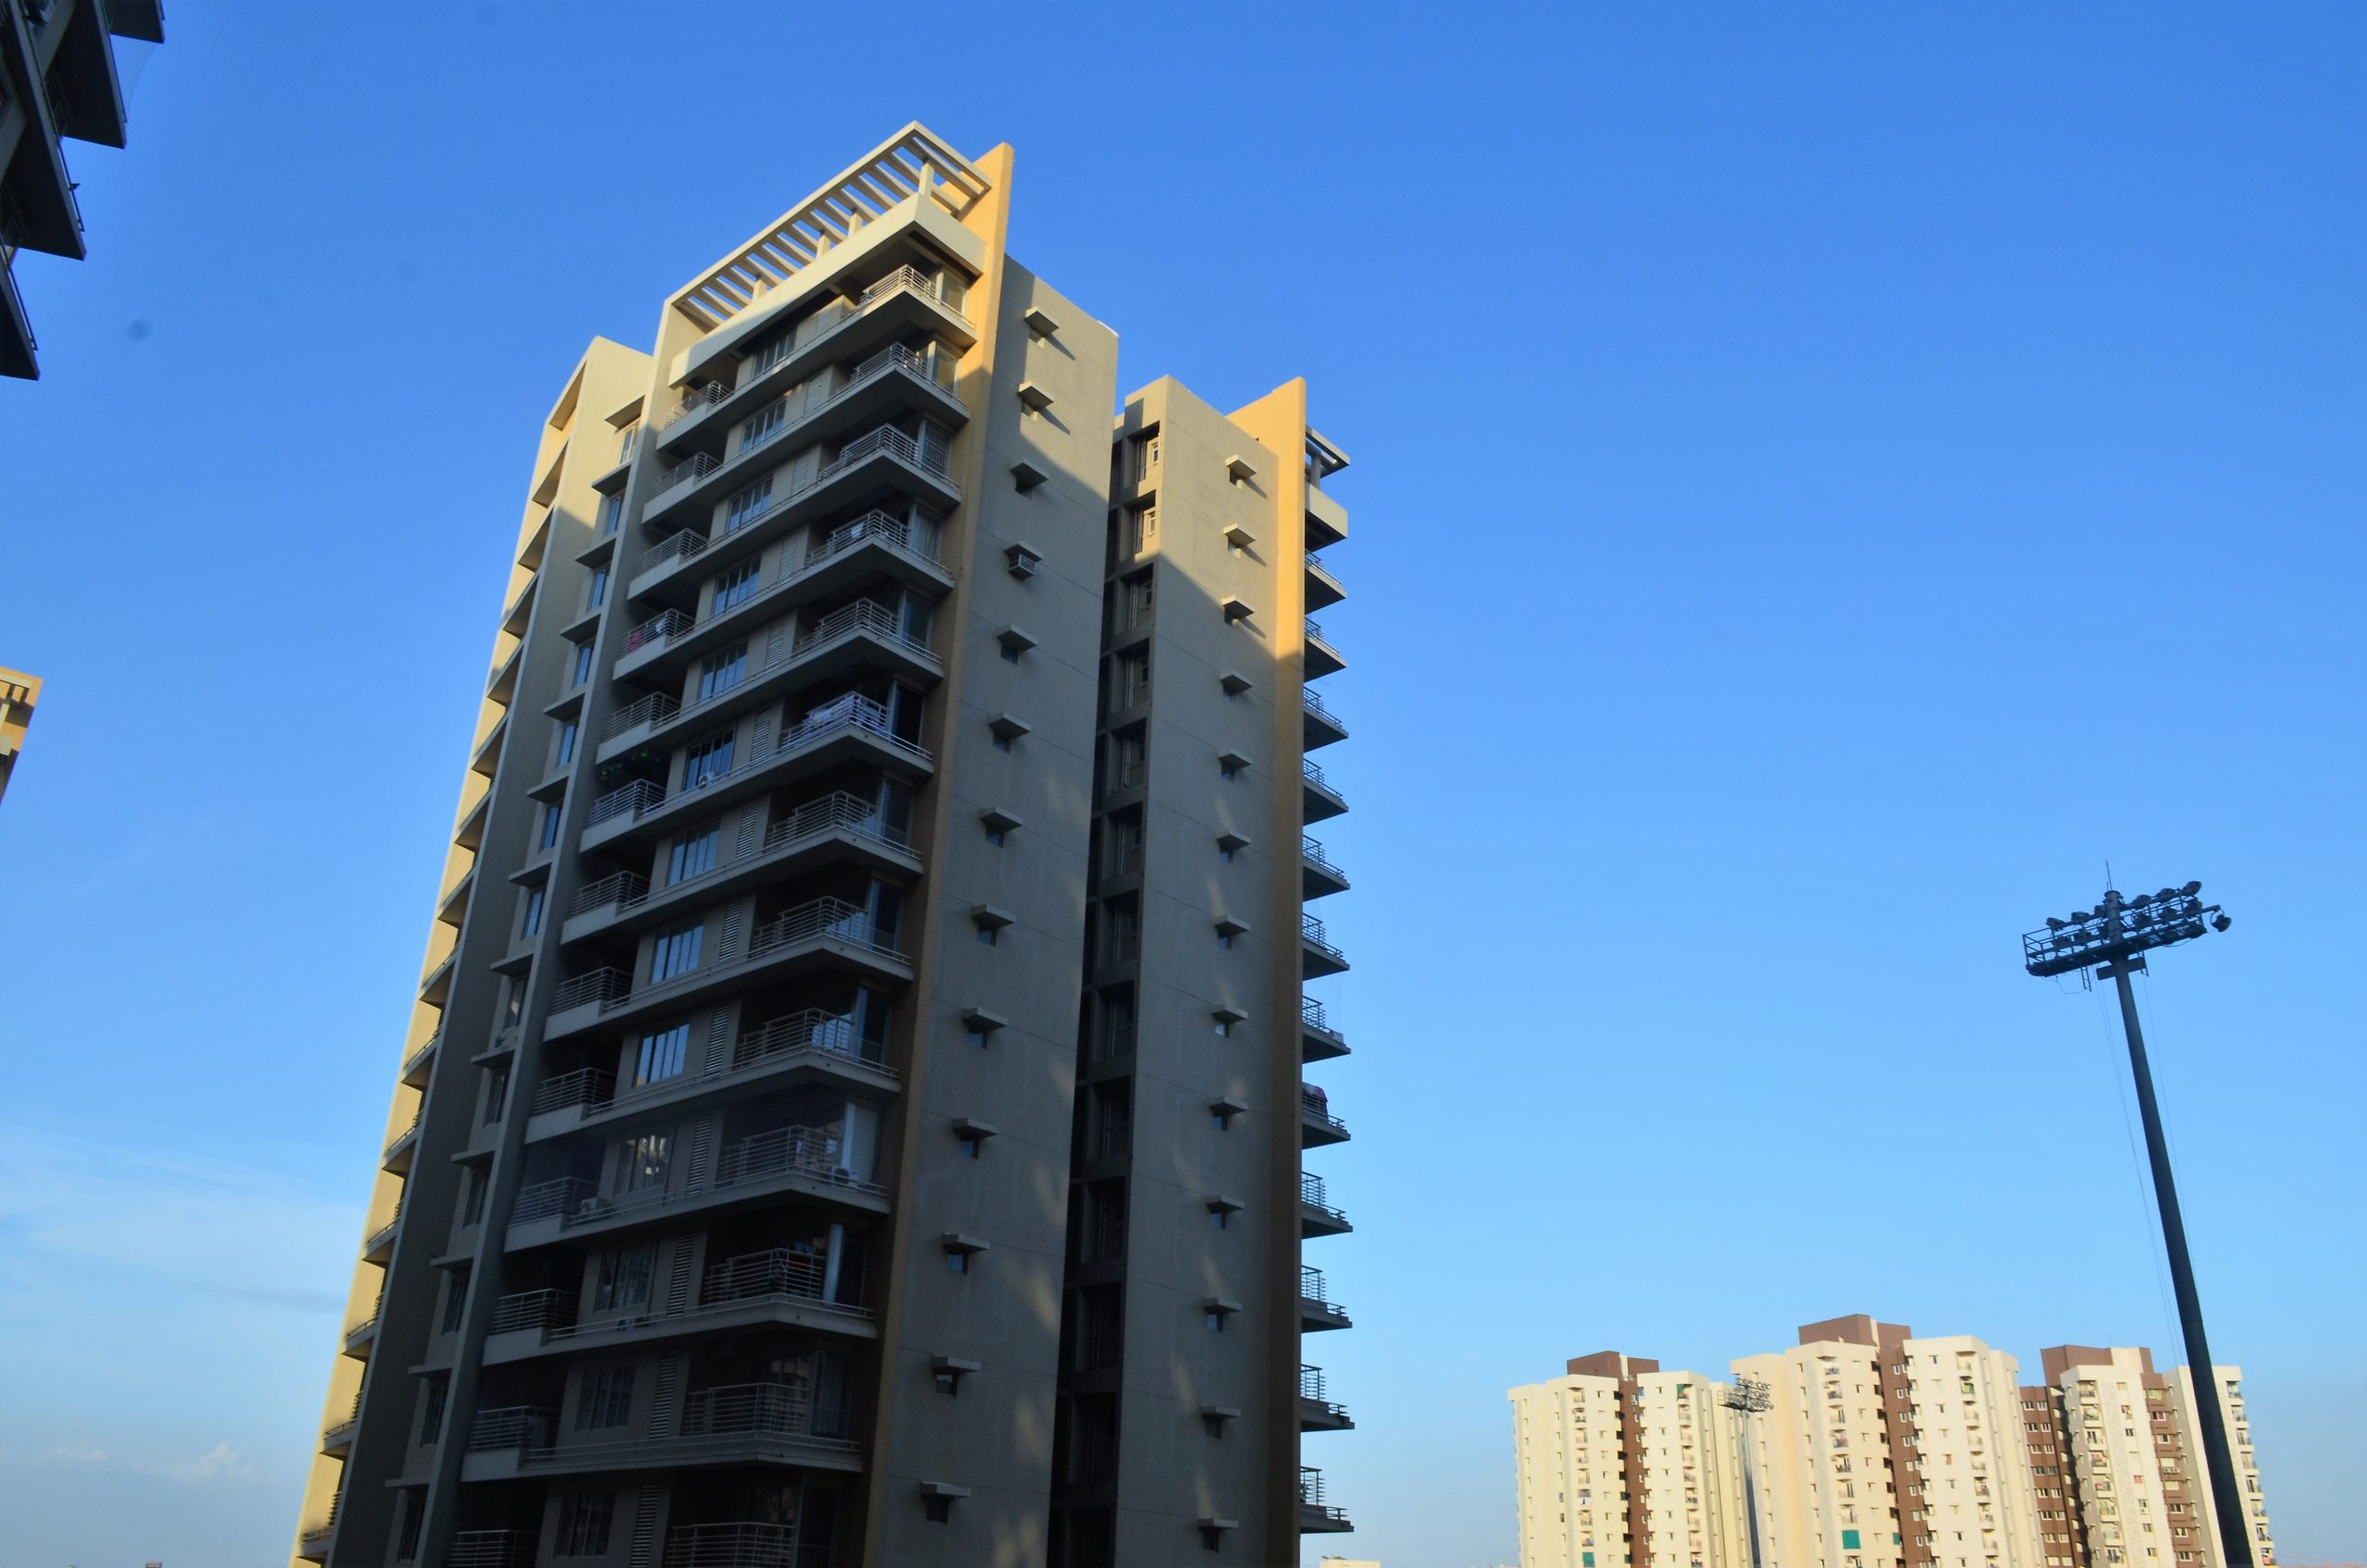 A high building